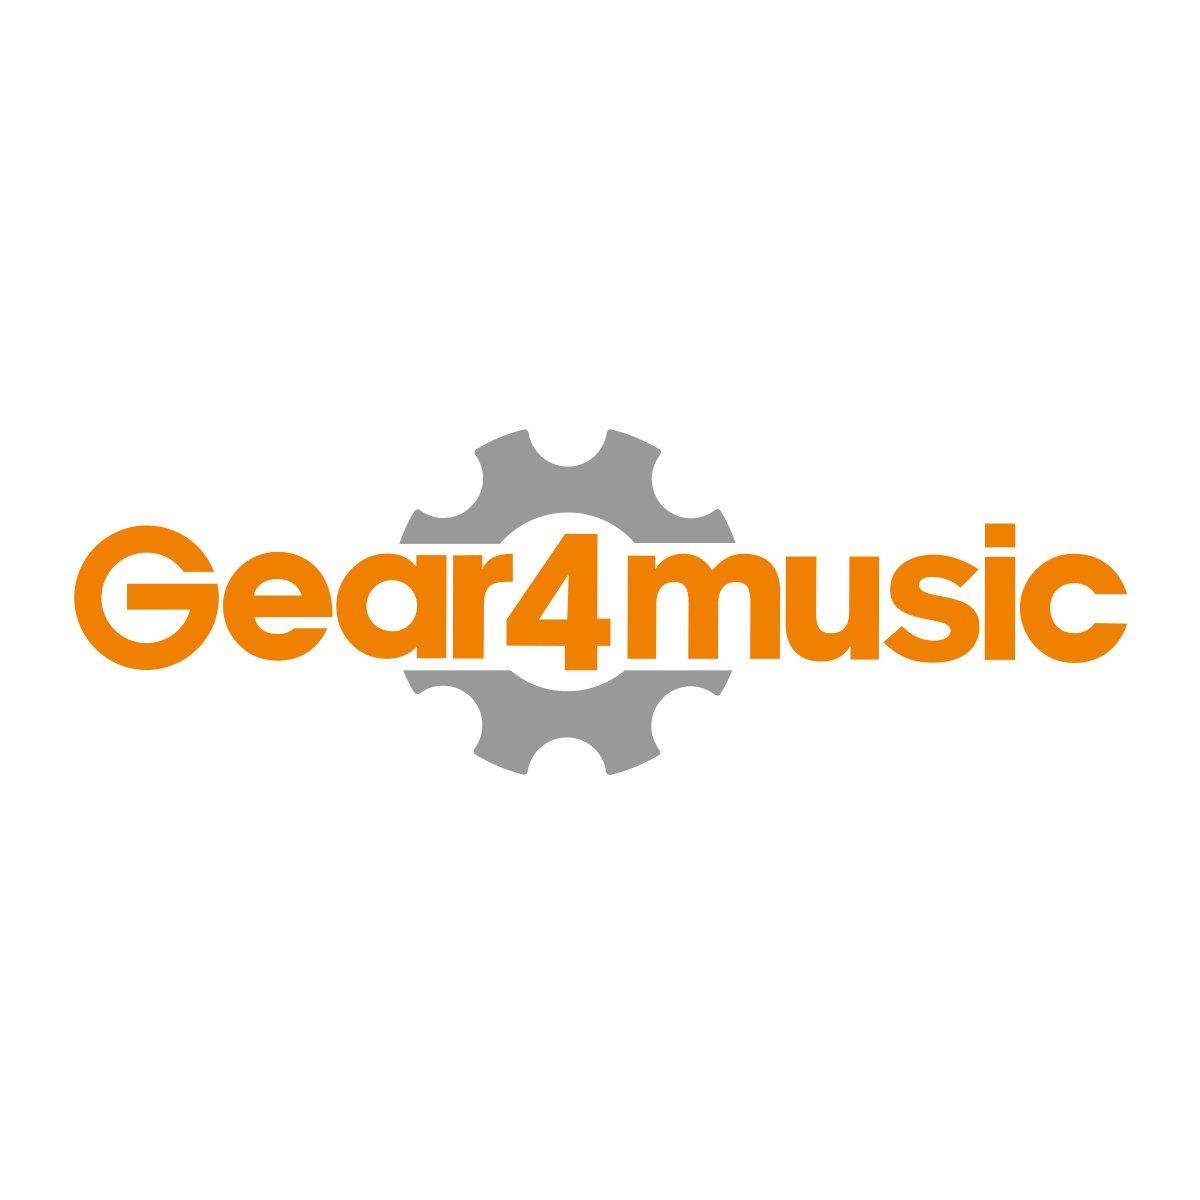 chicago short scale bass guitar by gear4music sunburst at gear4music. Black Bedroom Furniture Sets. Home Design Ideas